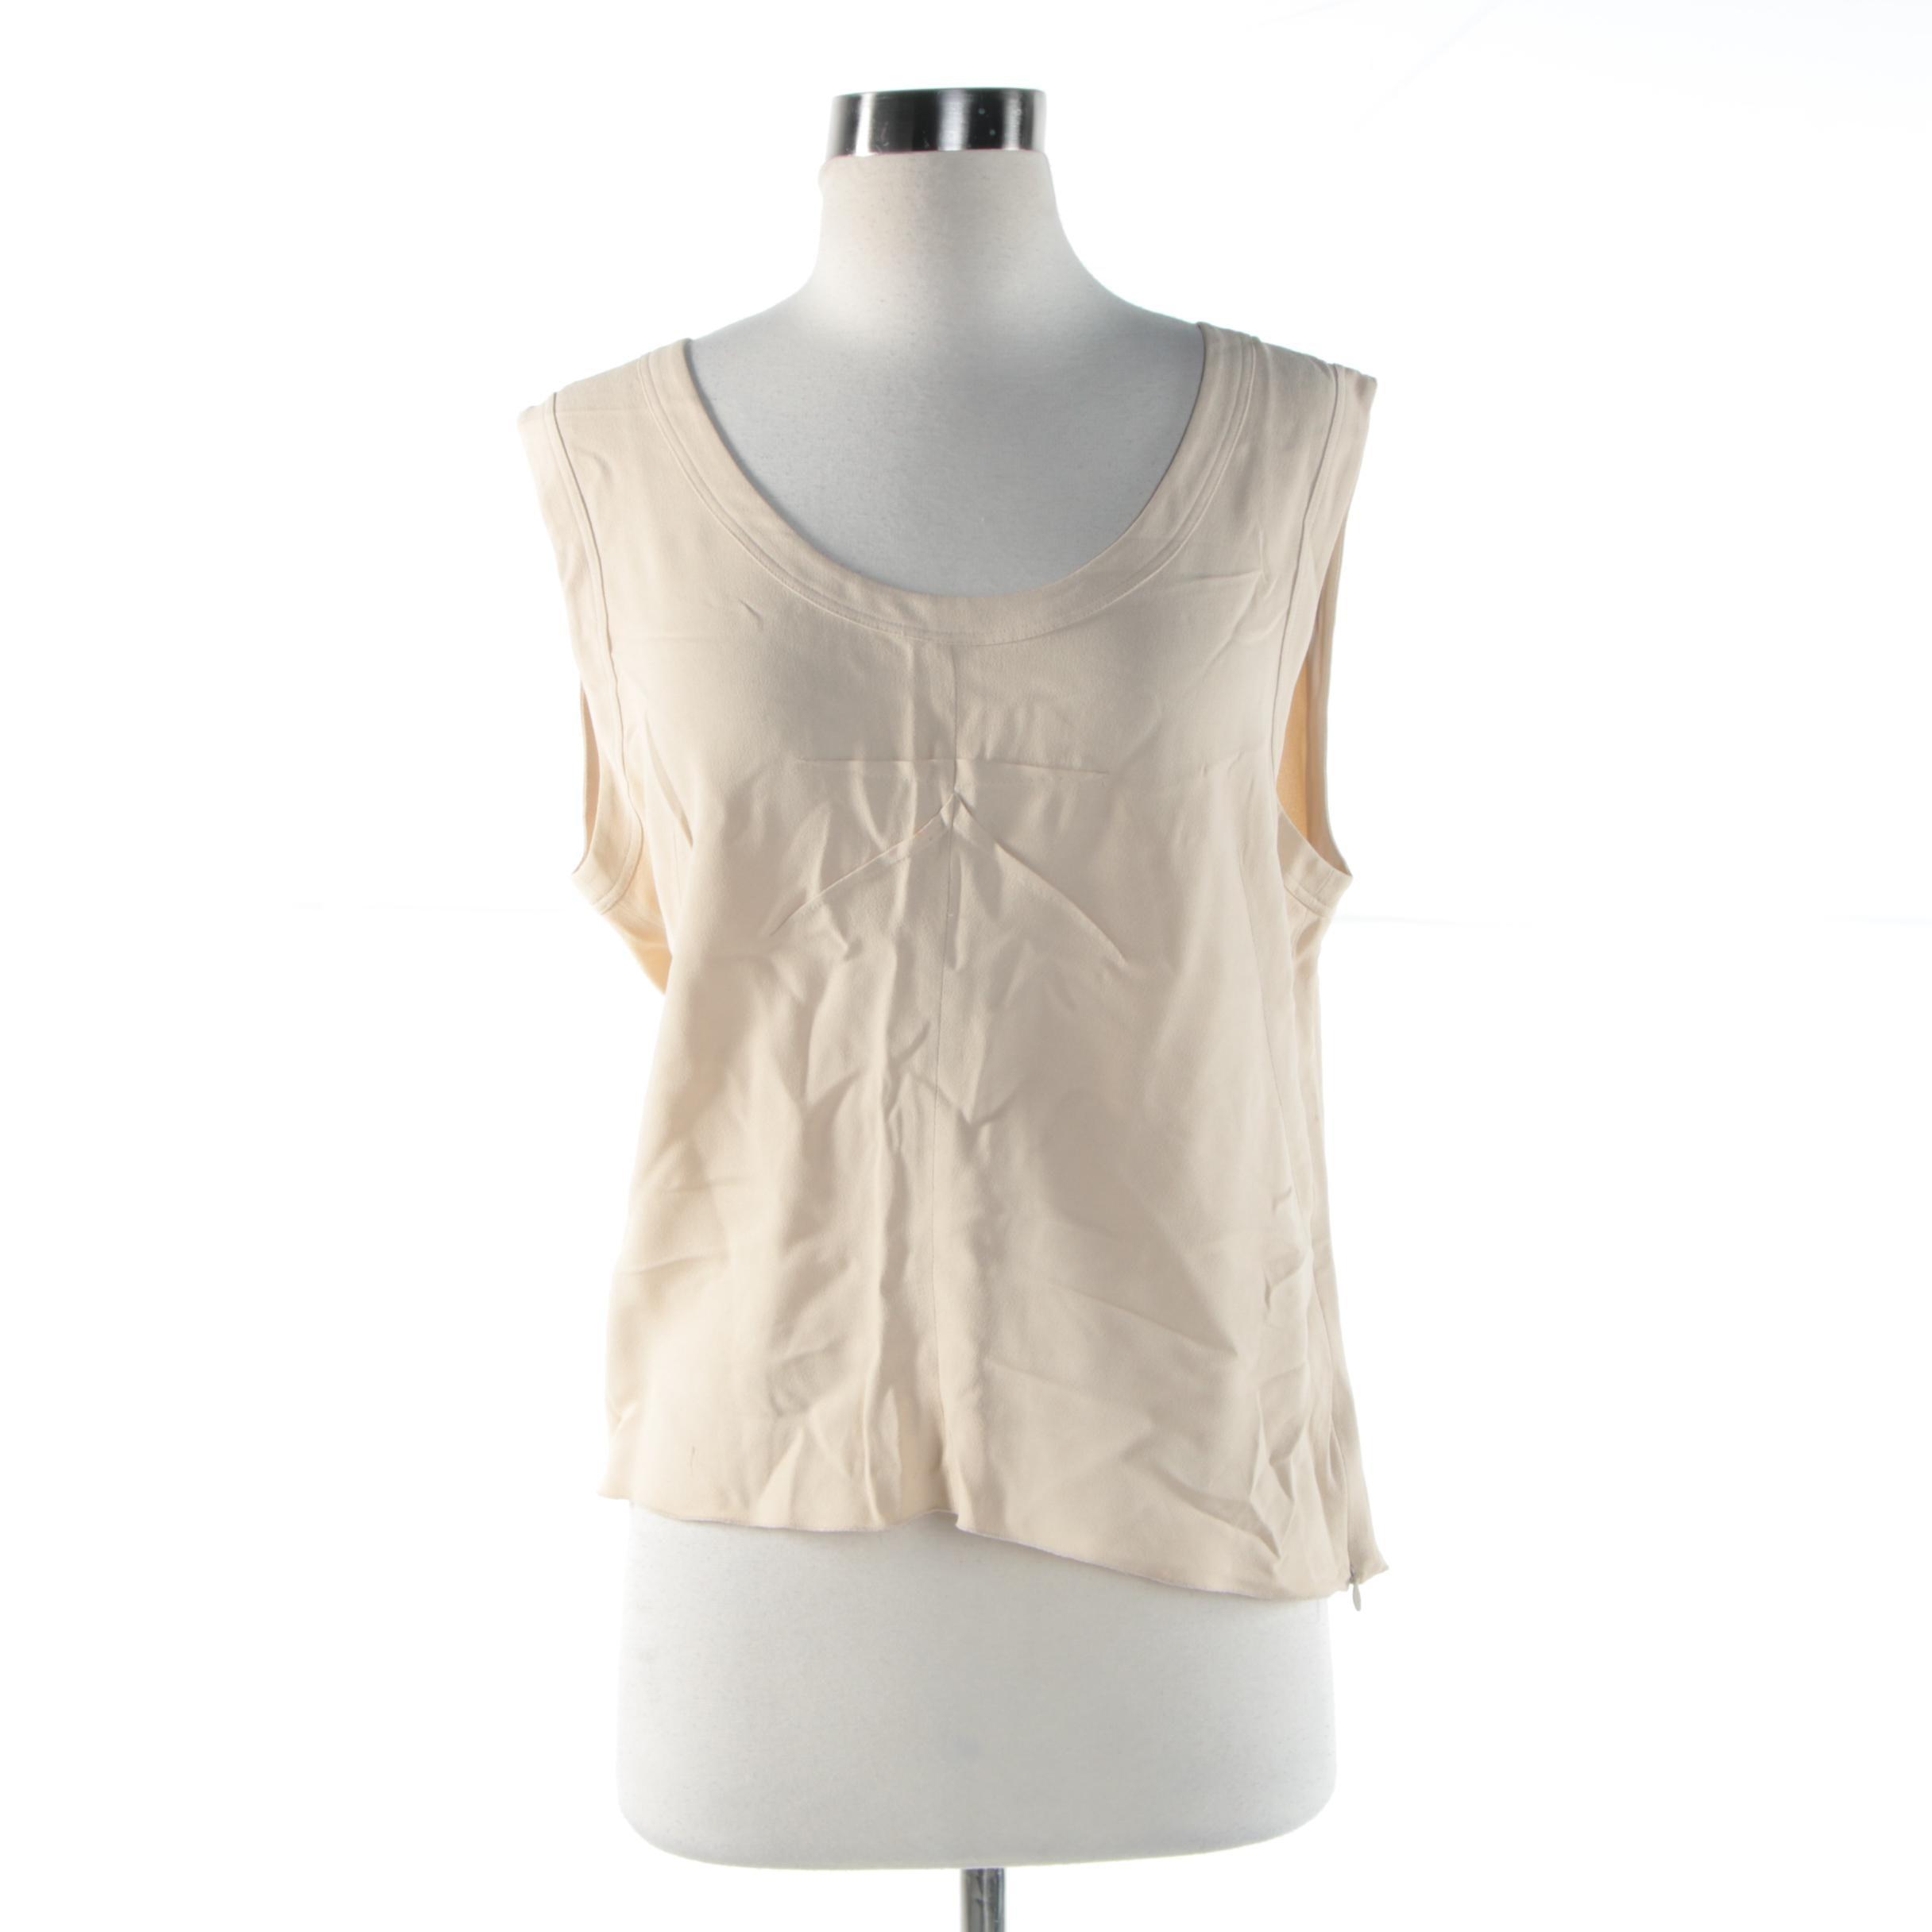 Women's Prada Beige Sleeveless Top